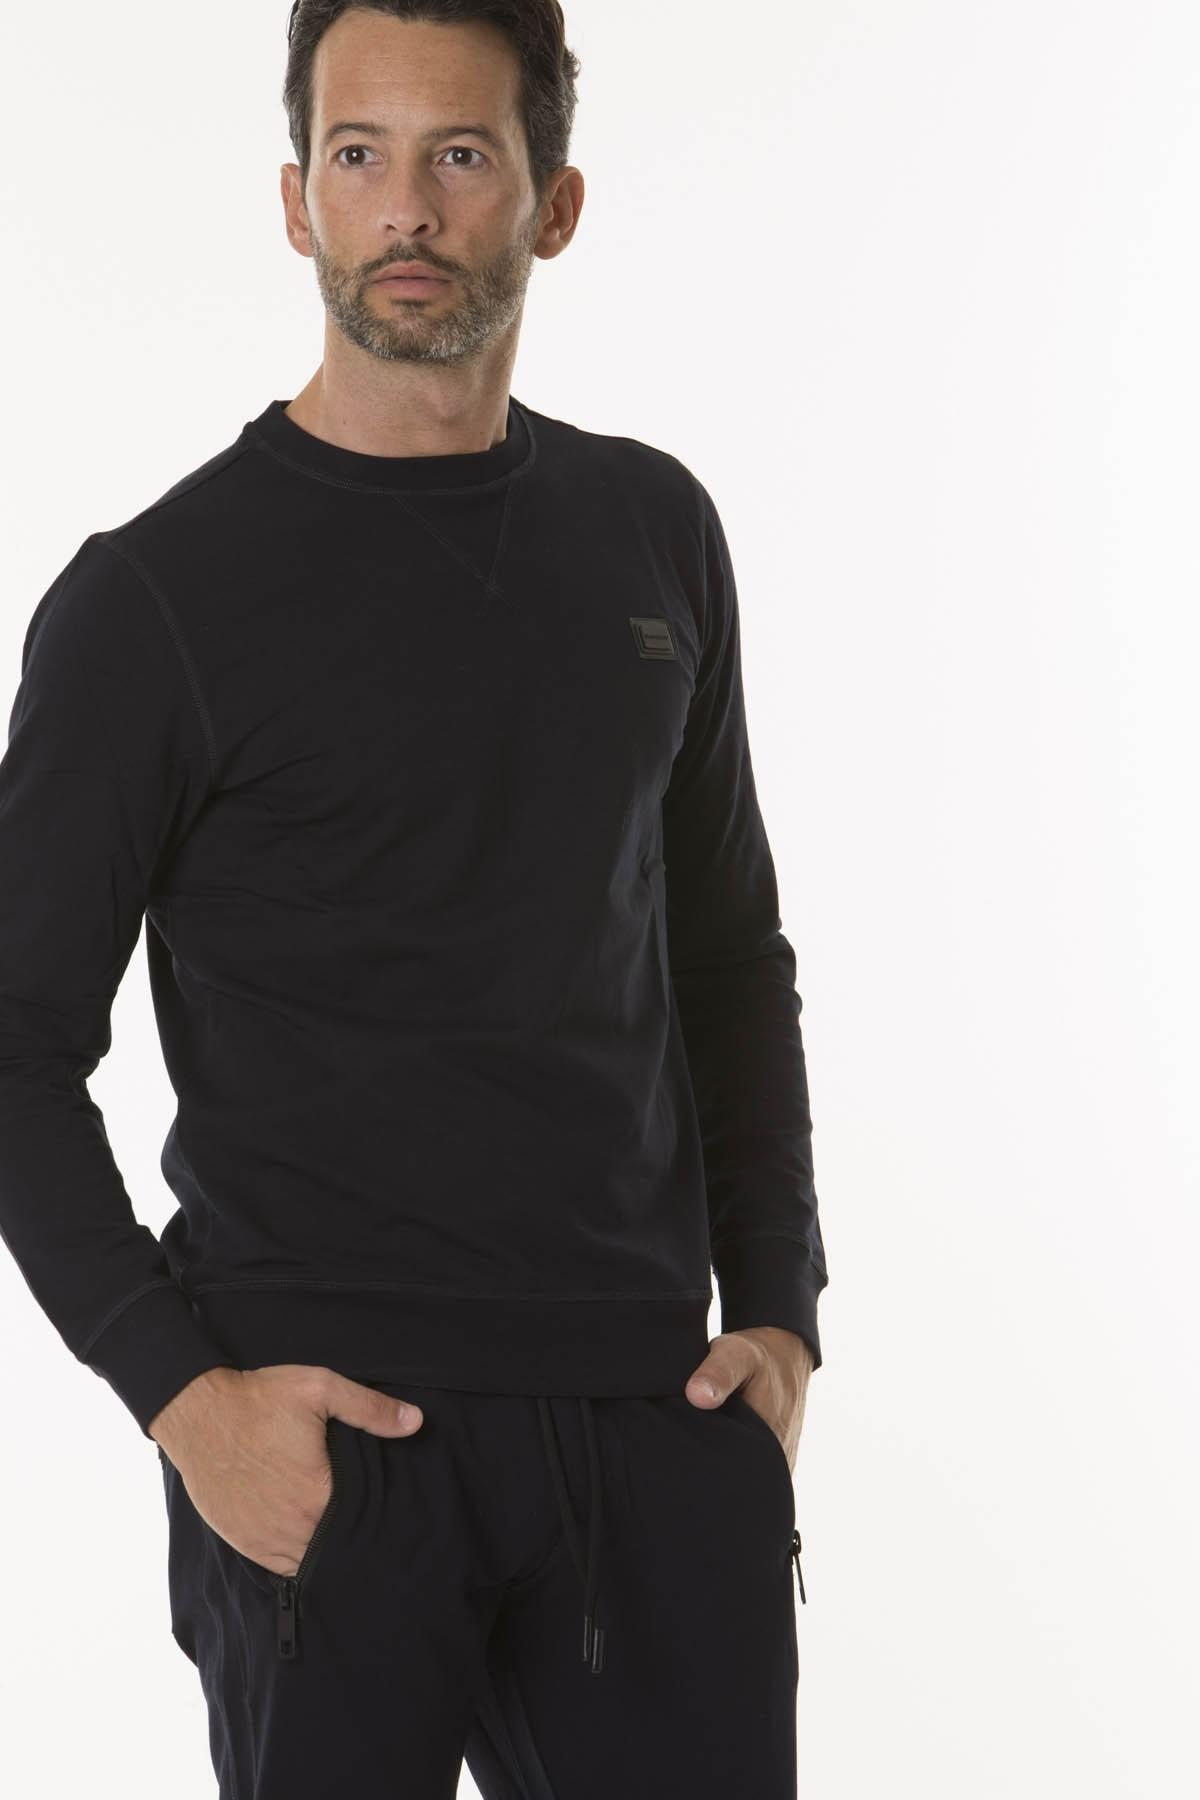 Sweatshirt for man ANTONY MORATO F/W 18-19